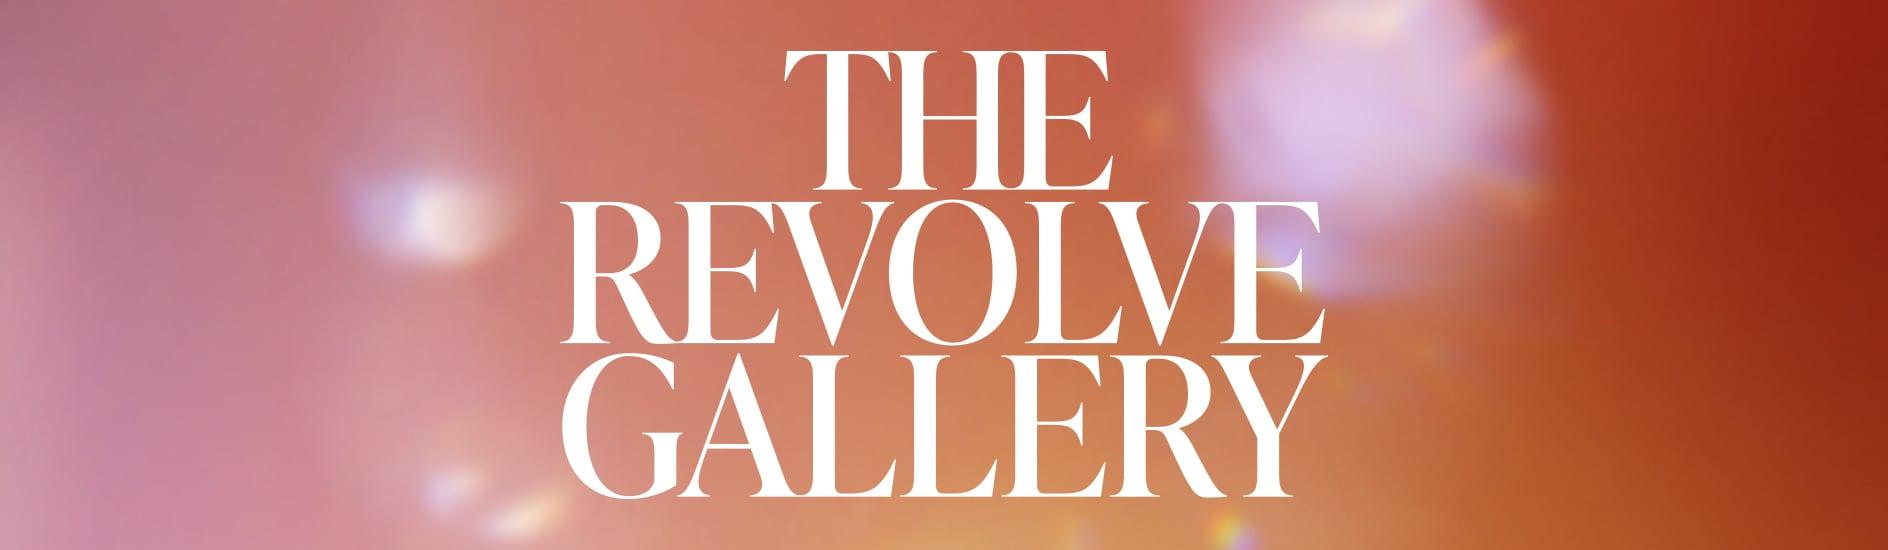 Revolve Gallery Banner